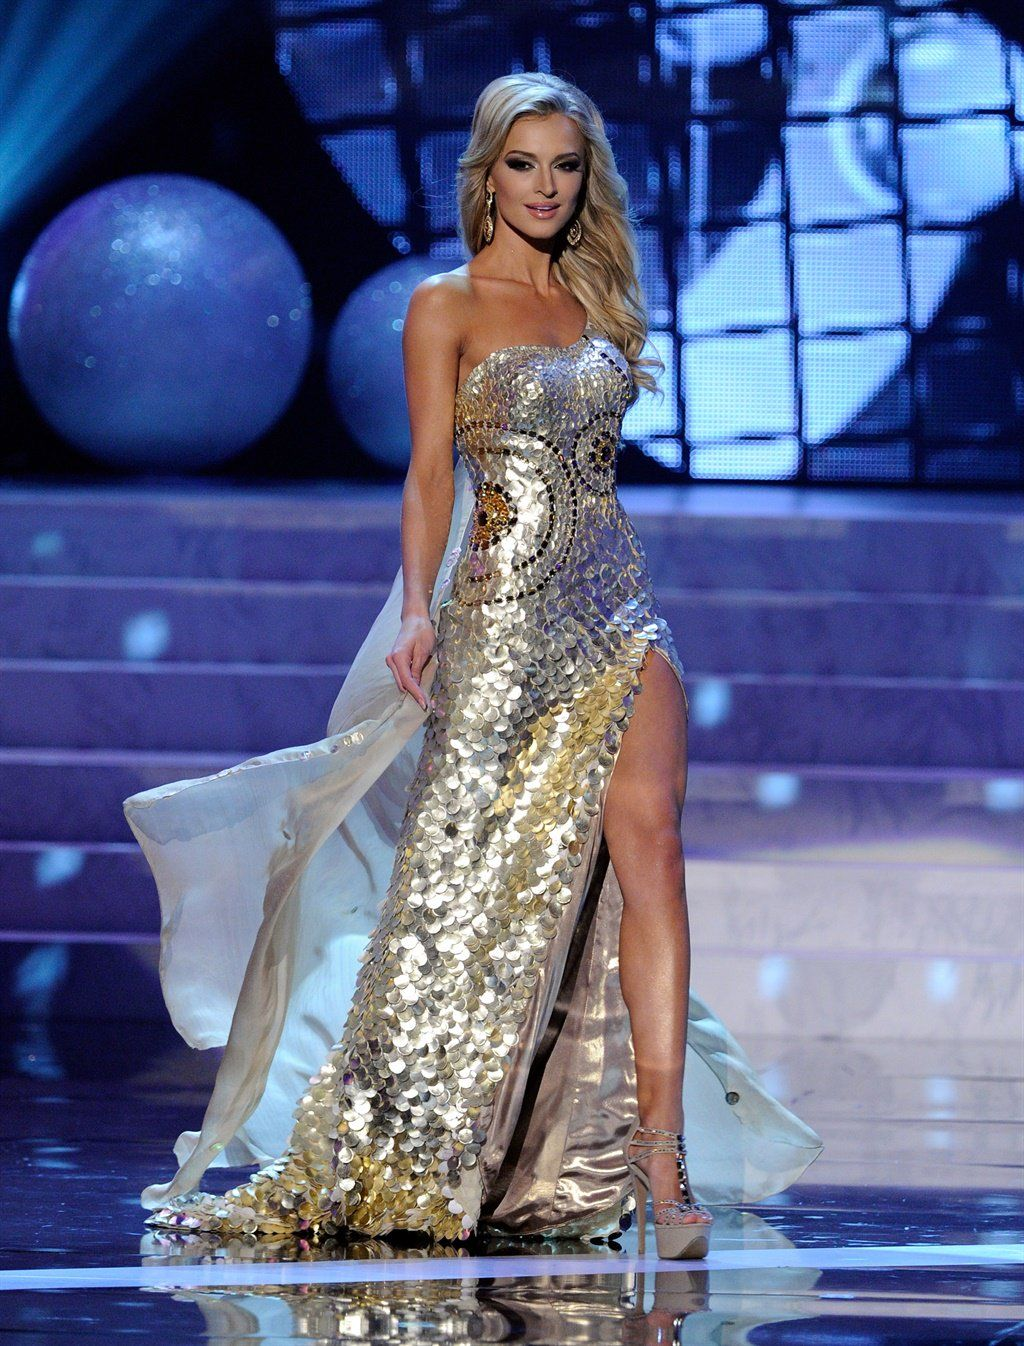 9 Gaun Terseksi Sepanjang Sejarah Miss Universe!